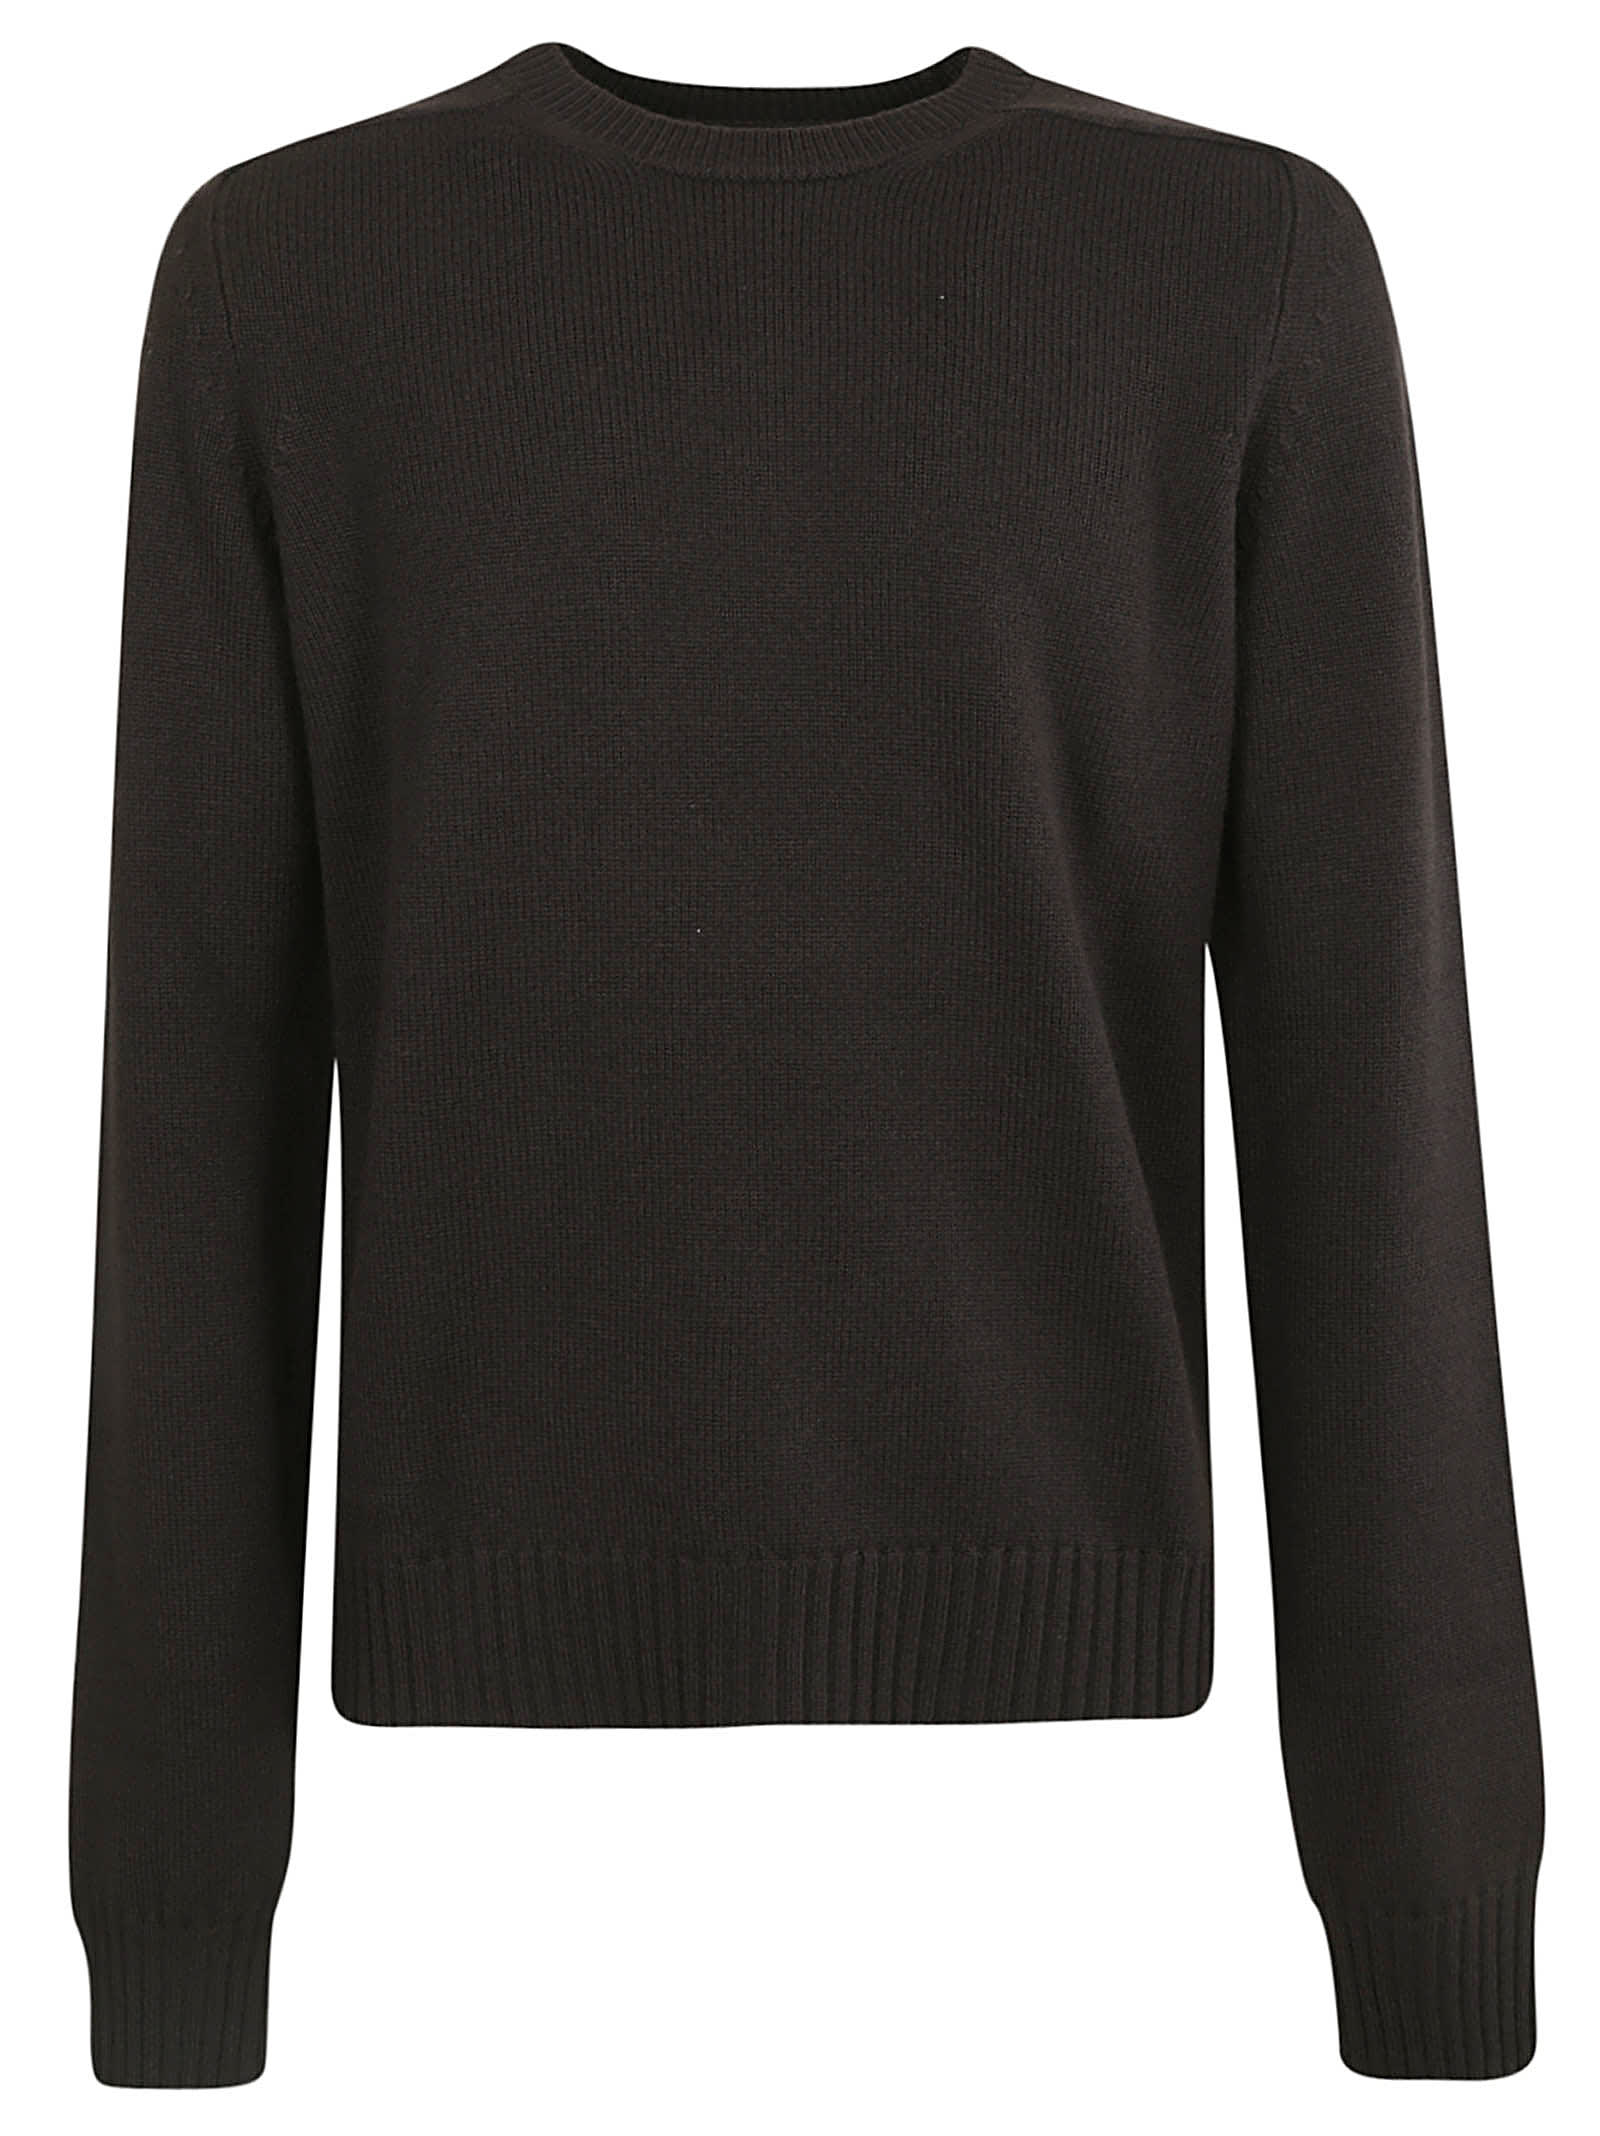 Bottega Veneta Cosy Knit Pullover